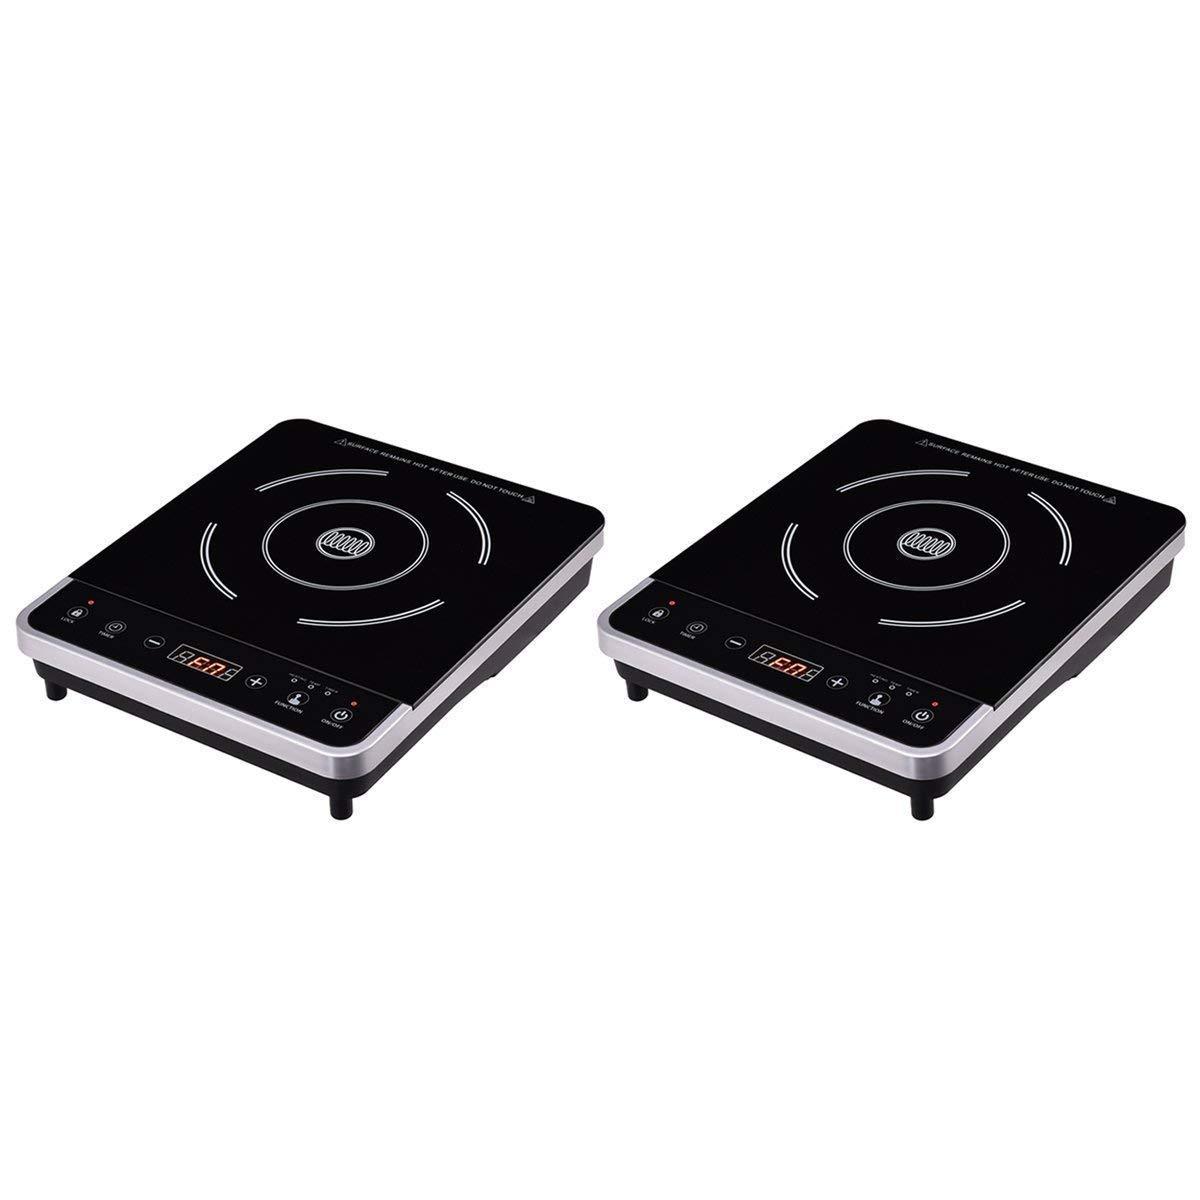 Costway 1800W Digital Induction Cooktop Countertop Burner,Electric Single Burner Hot Plate Cooktop Countertop with Timer,Temperature,Black (2)